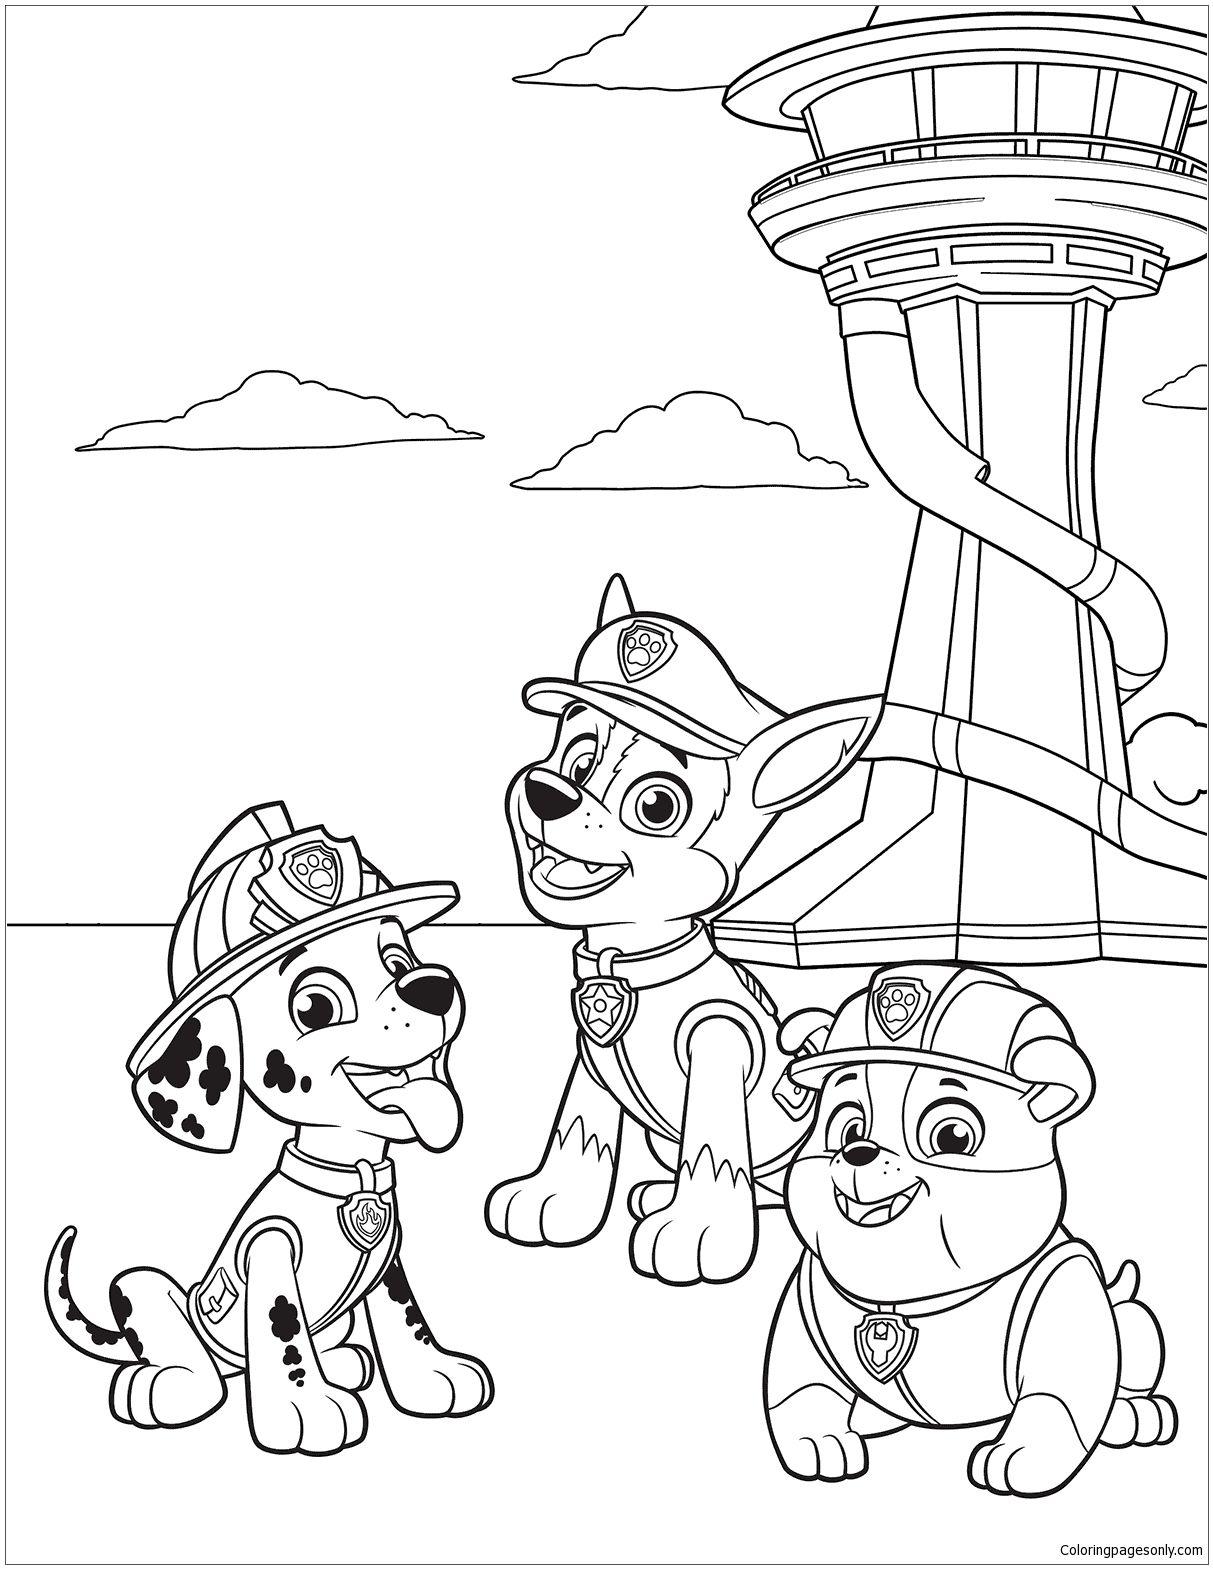 Paw Patrol 38 Coloring Page Paw Patrol Coloring Pages